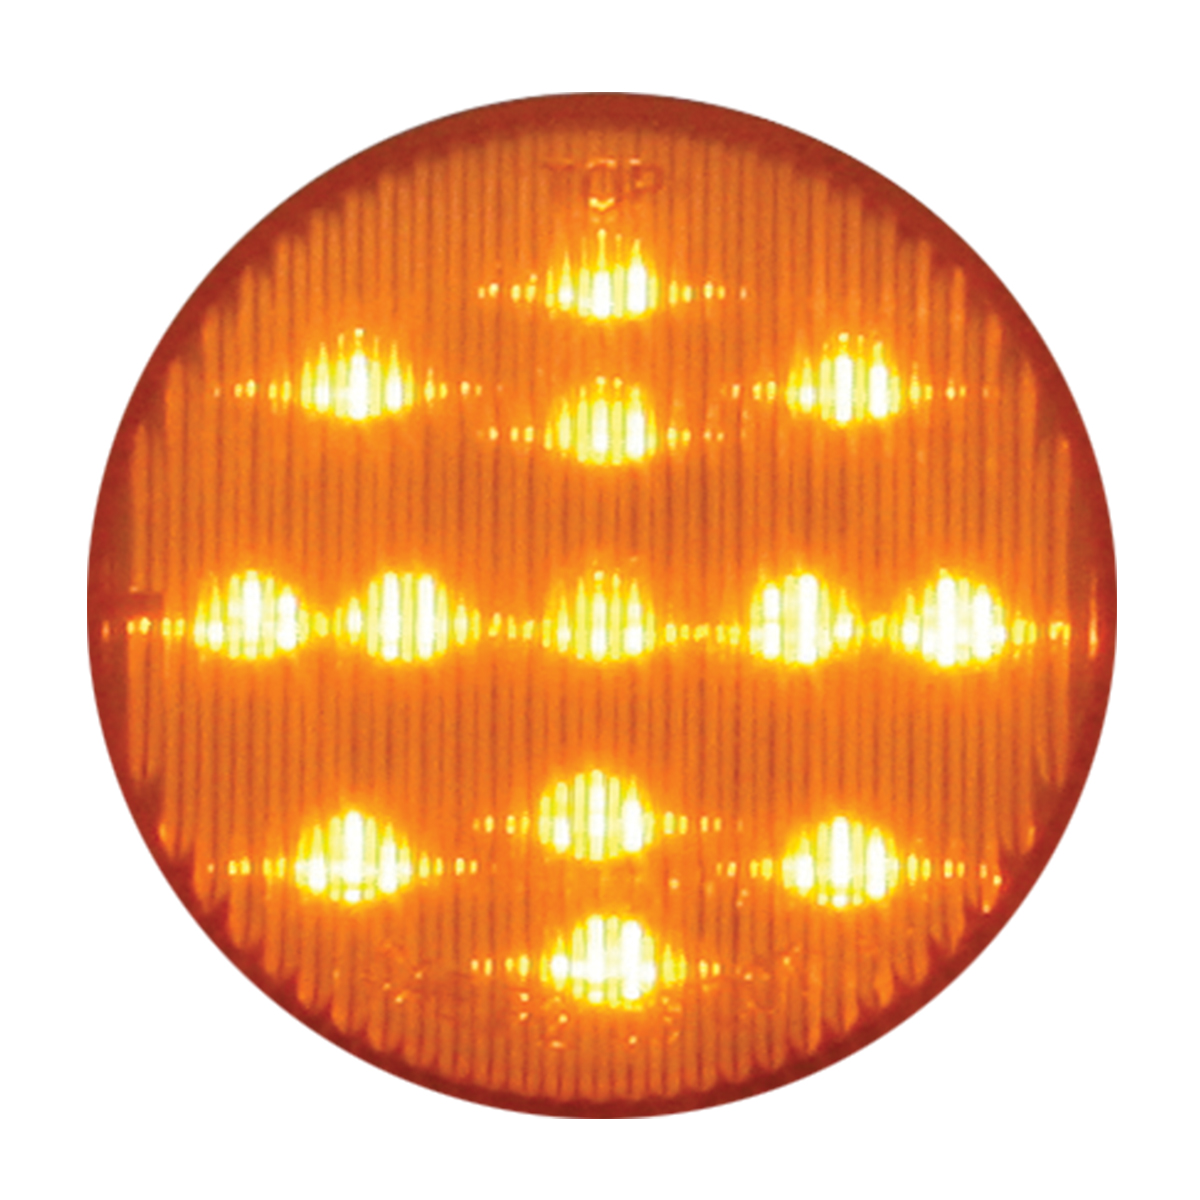 "79310 2-1/2"" Round Fleet Marker Light"